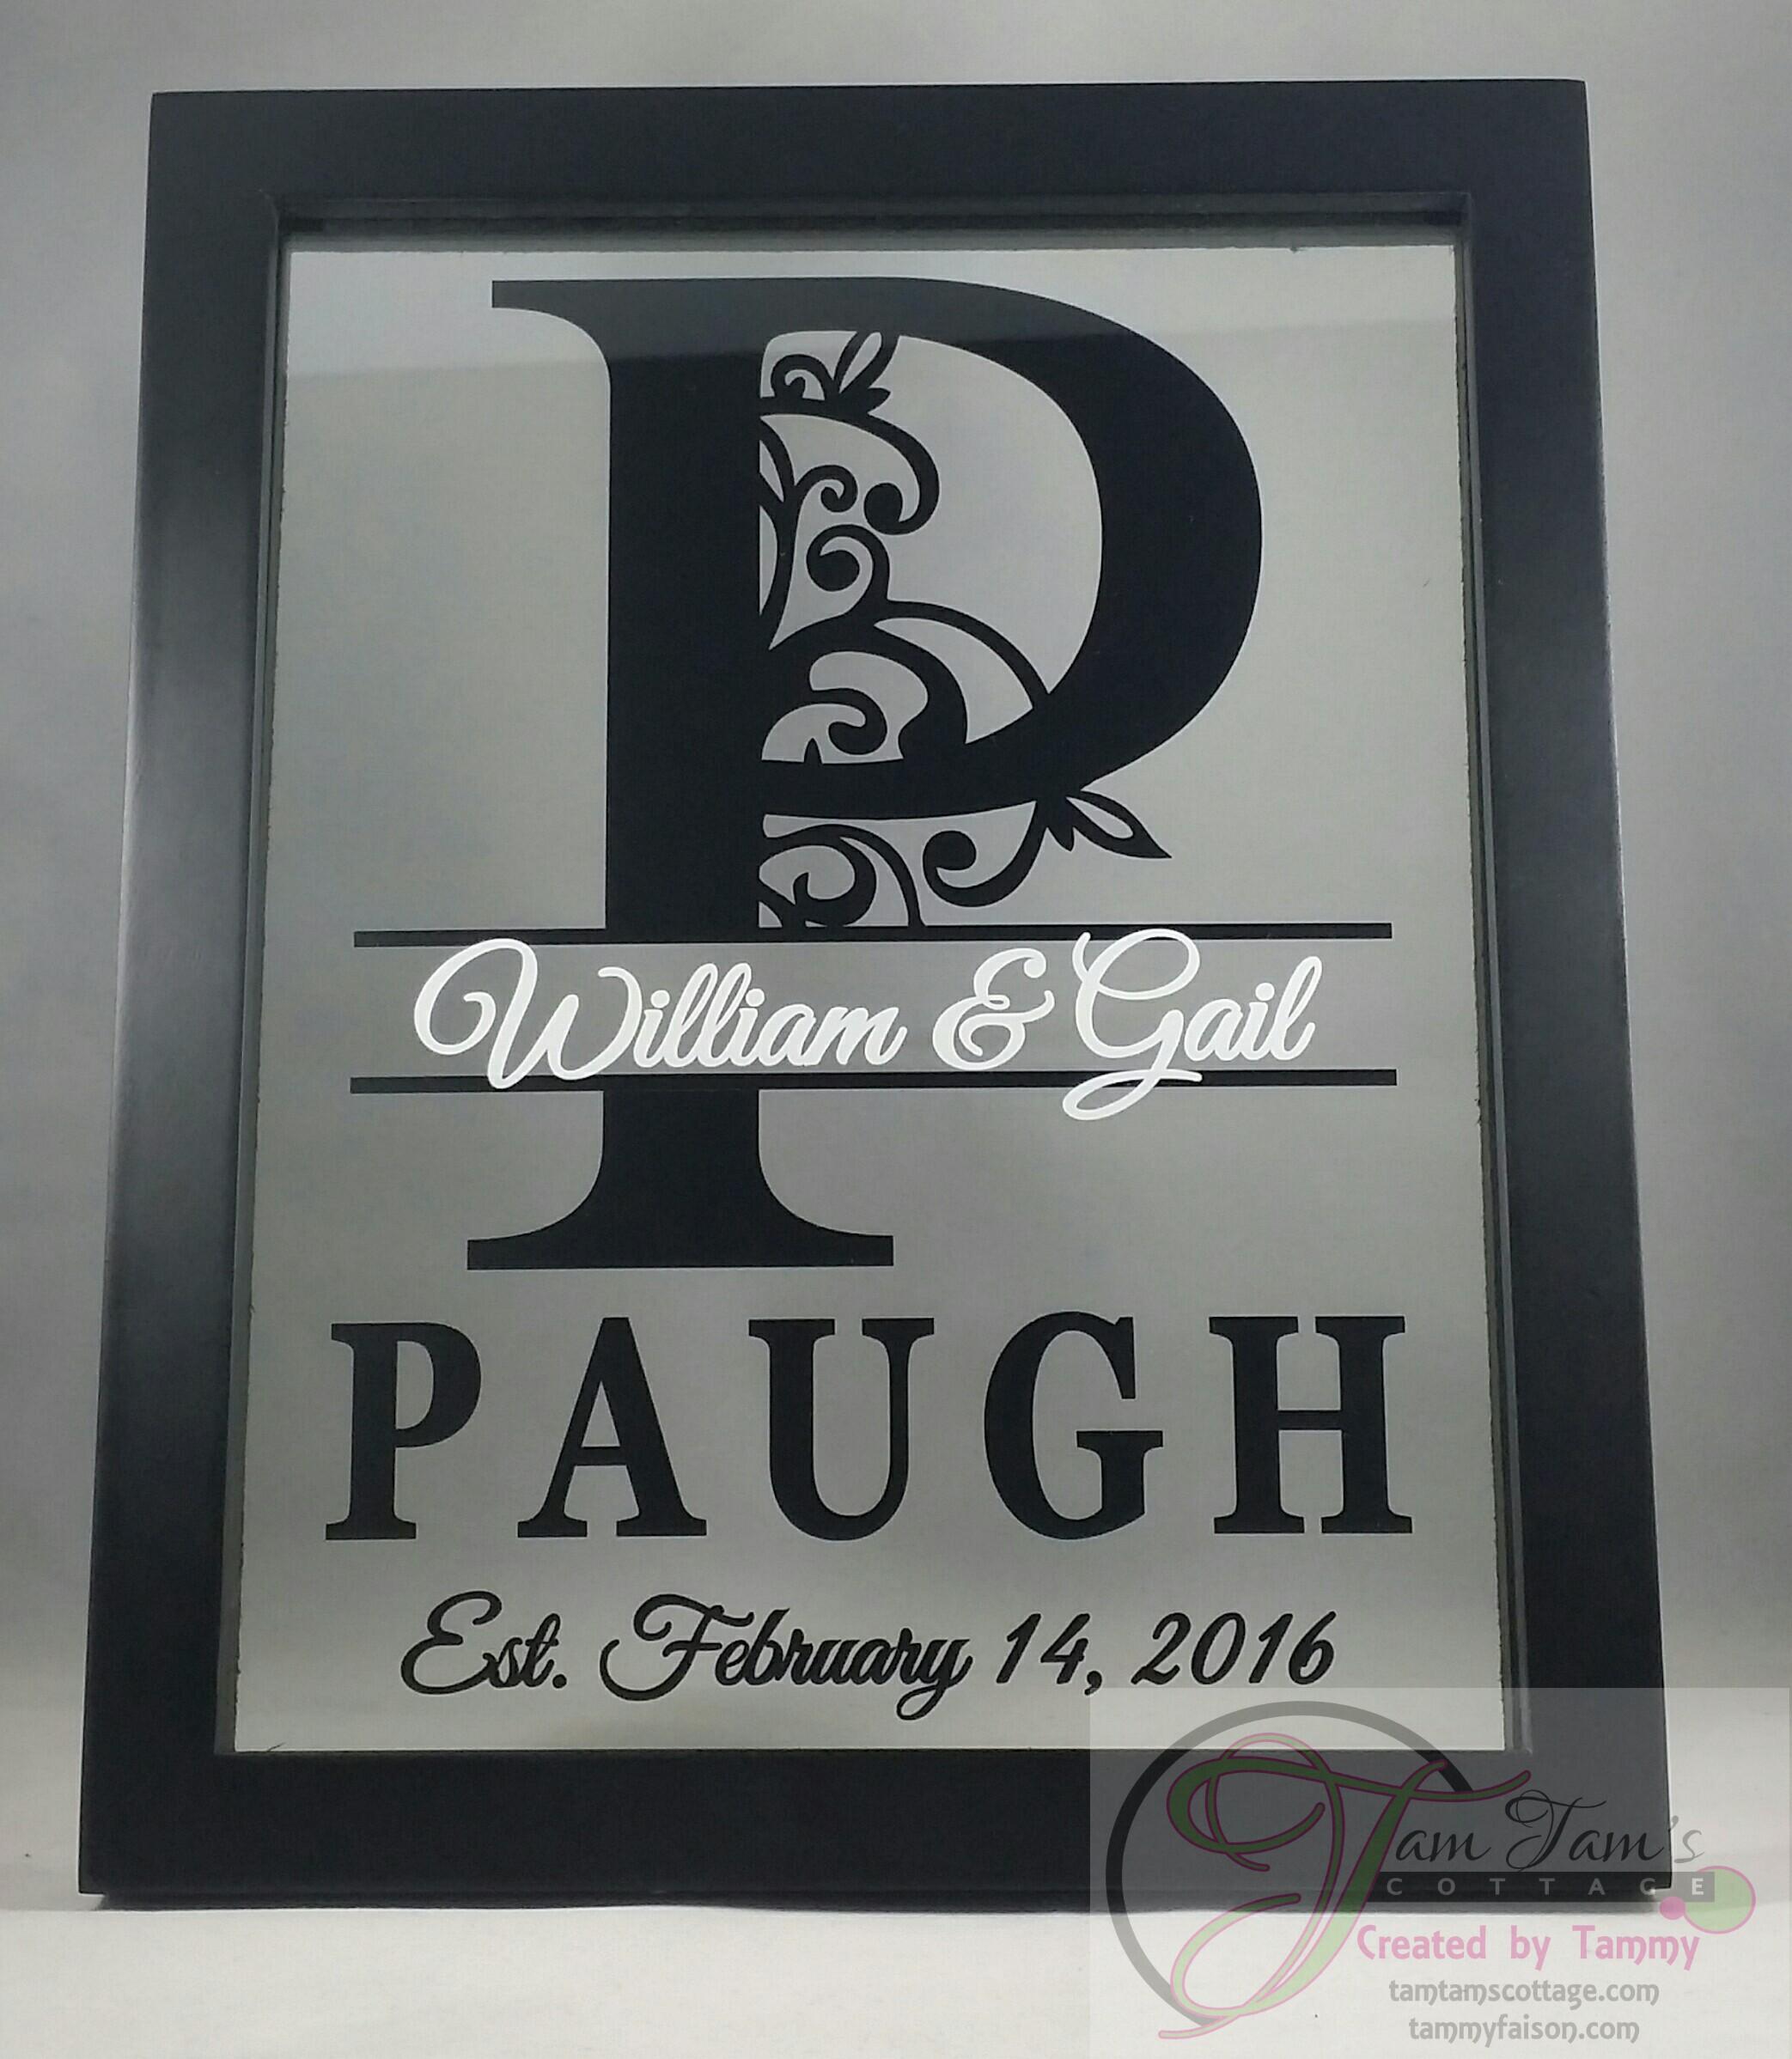 Personalized Last Name Floating Frame 8x10, Wedding Gift